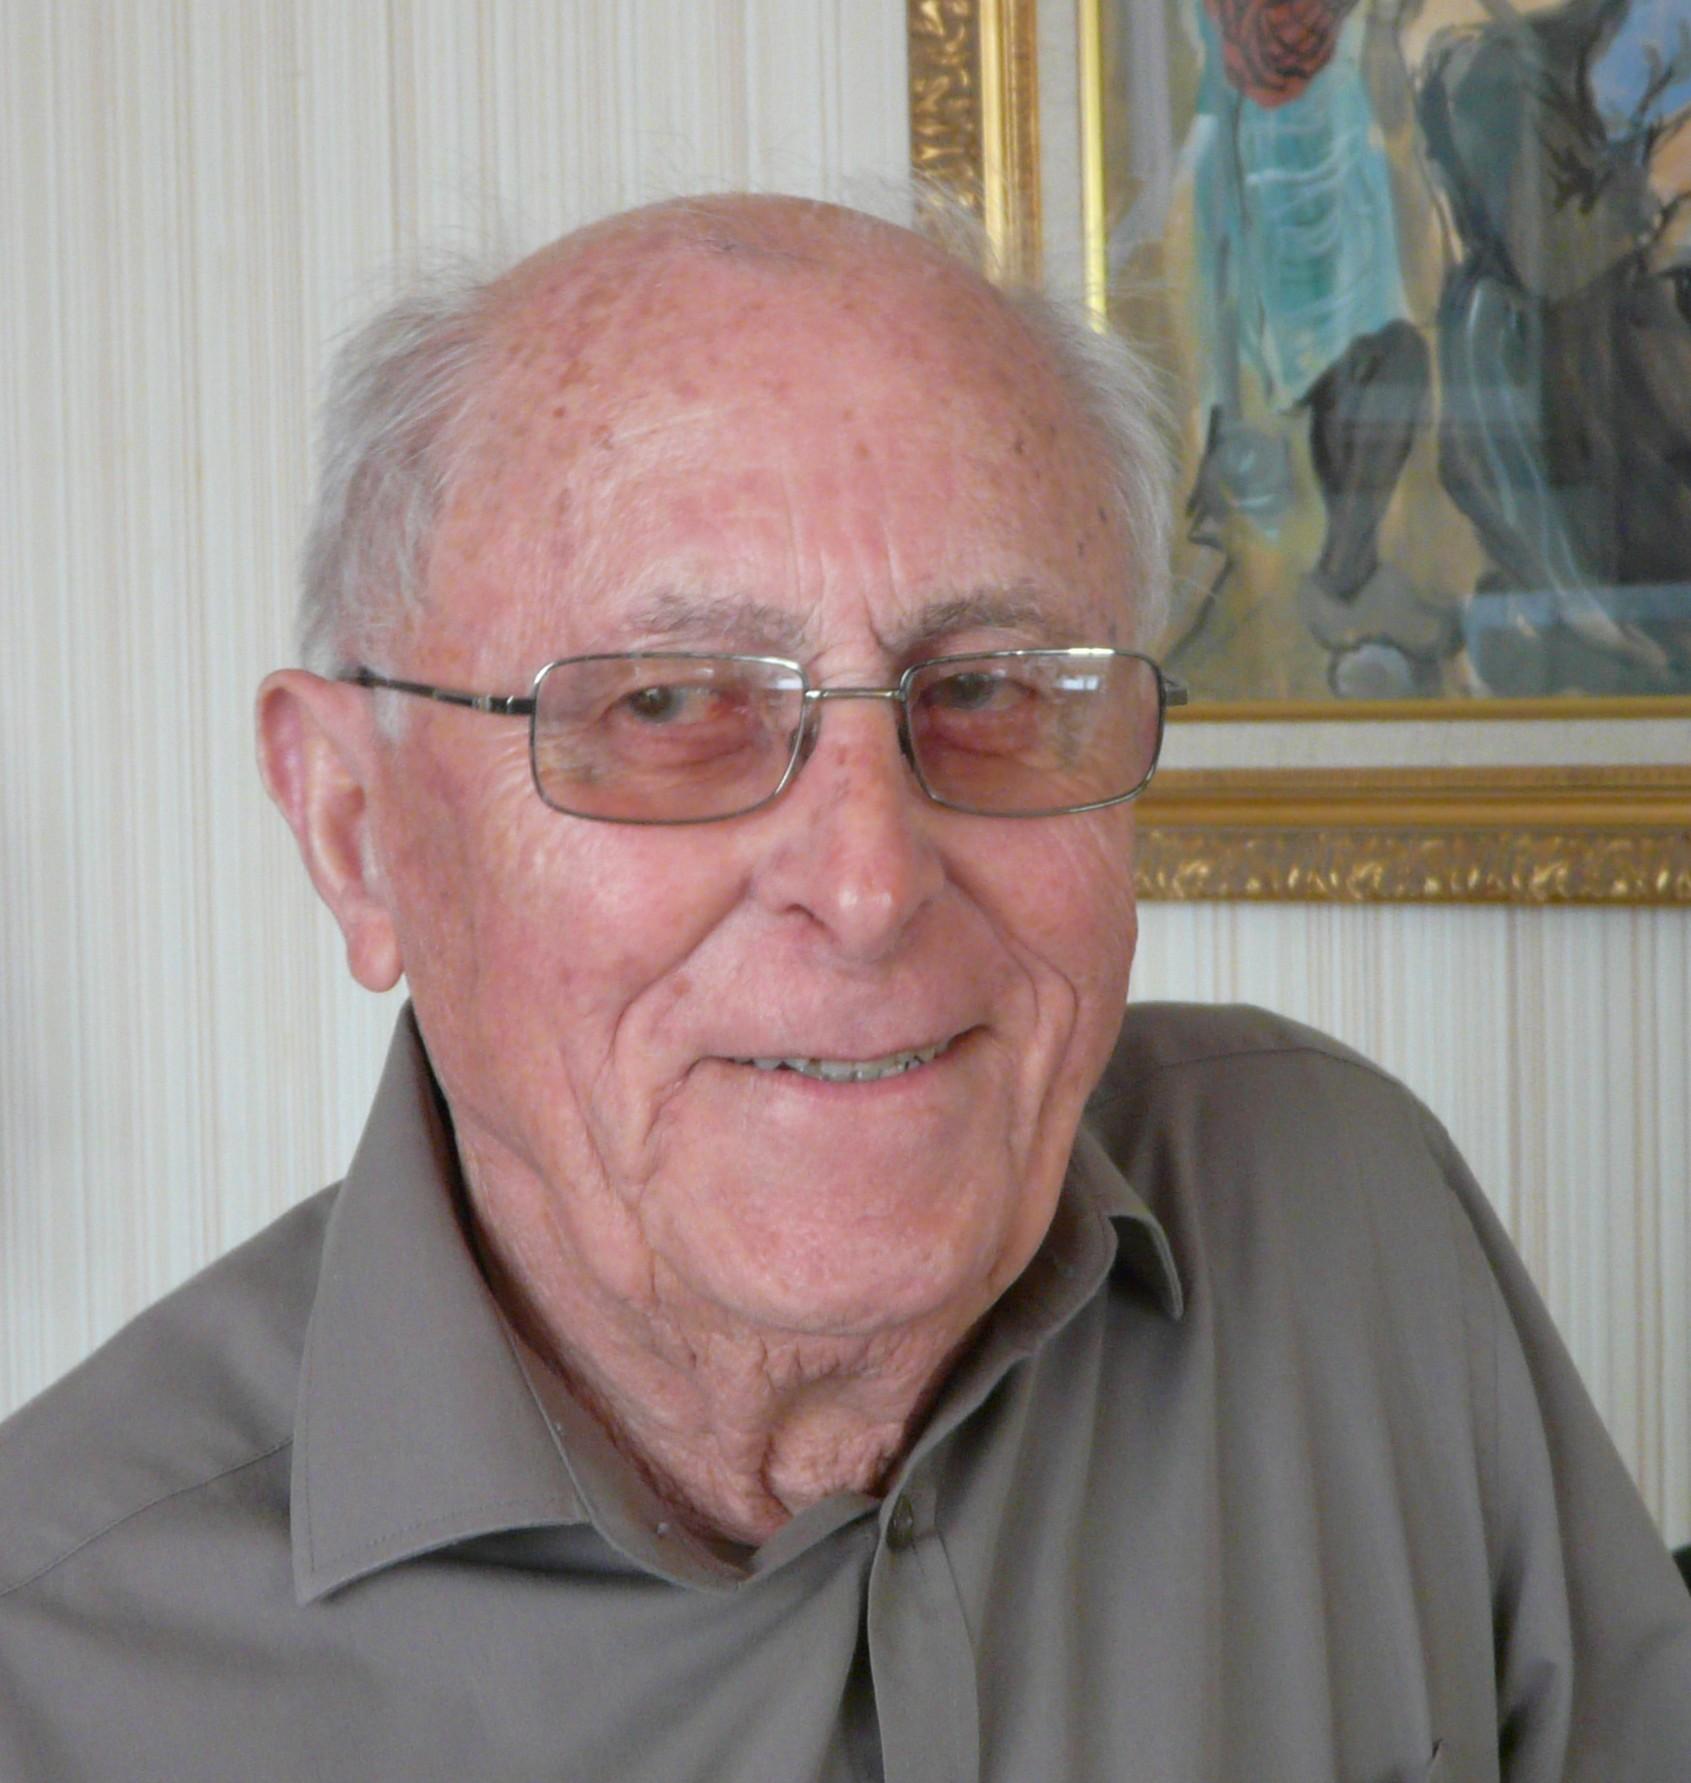 Robert Fouchard